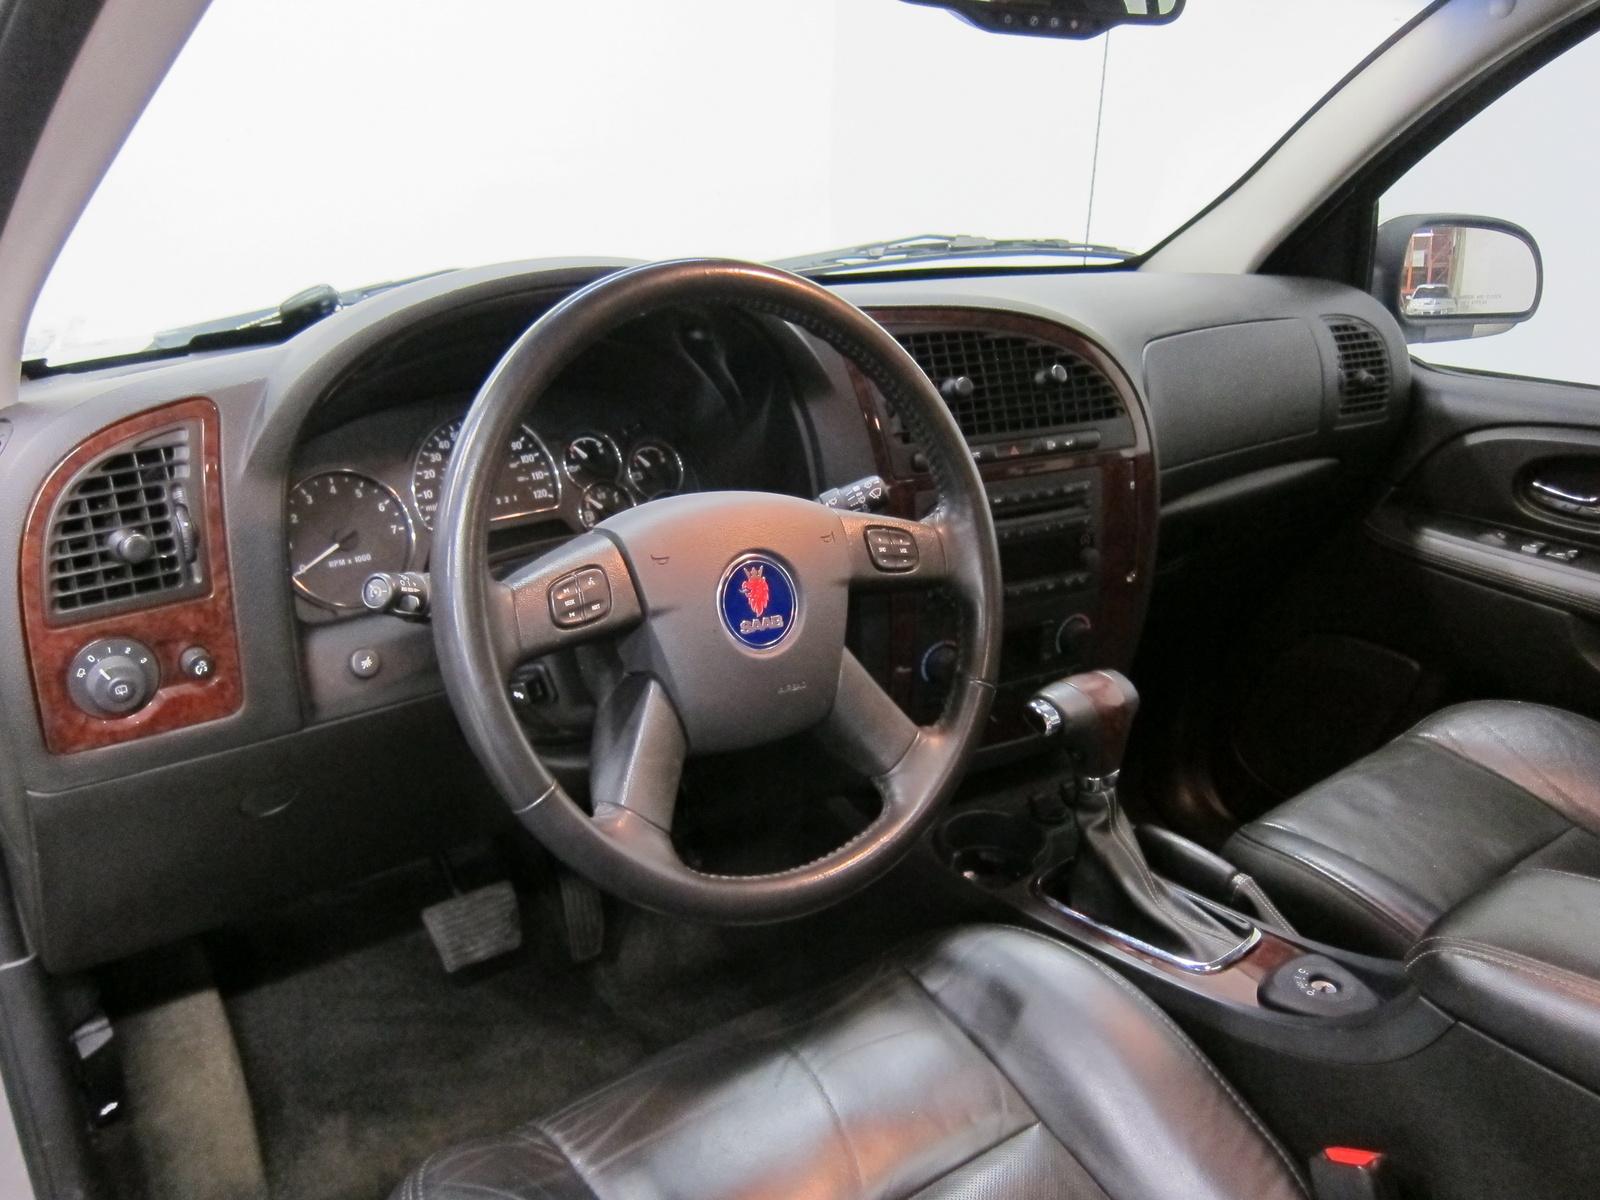 2009 saab 9 7x - 2006 Saab 9 7x Interior Pictures Cargurus